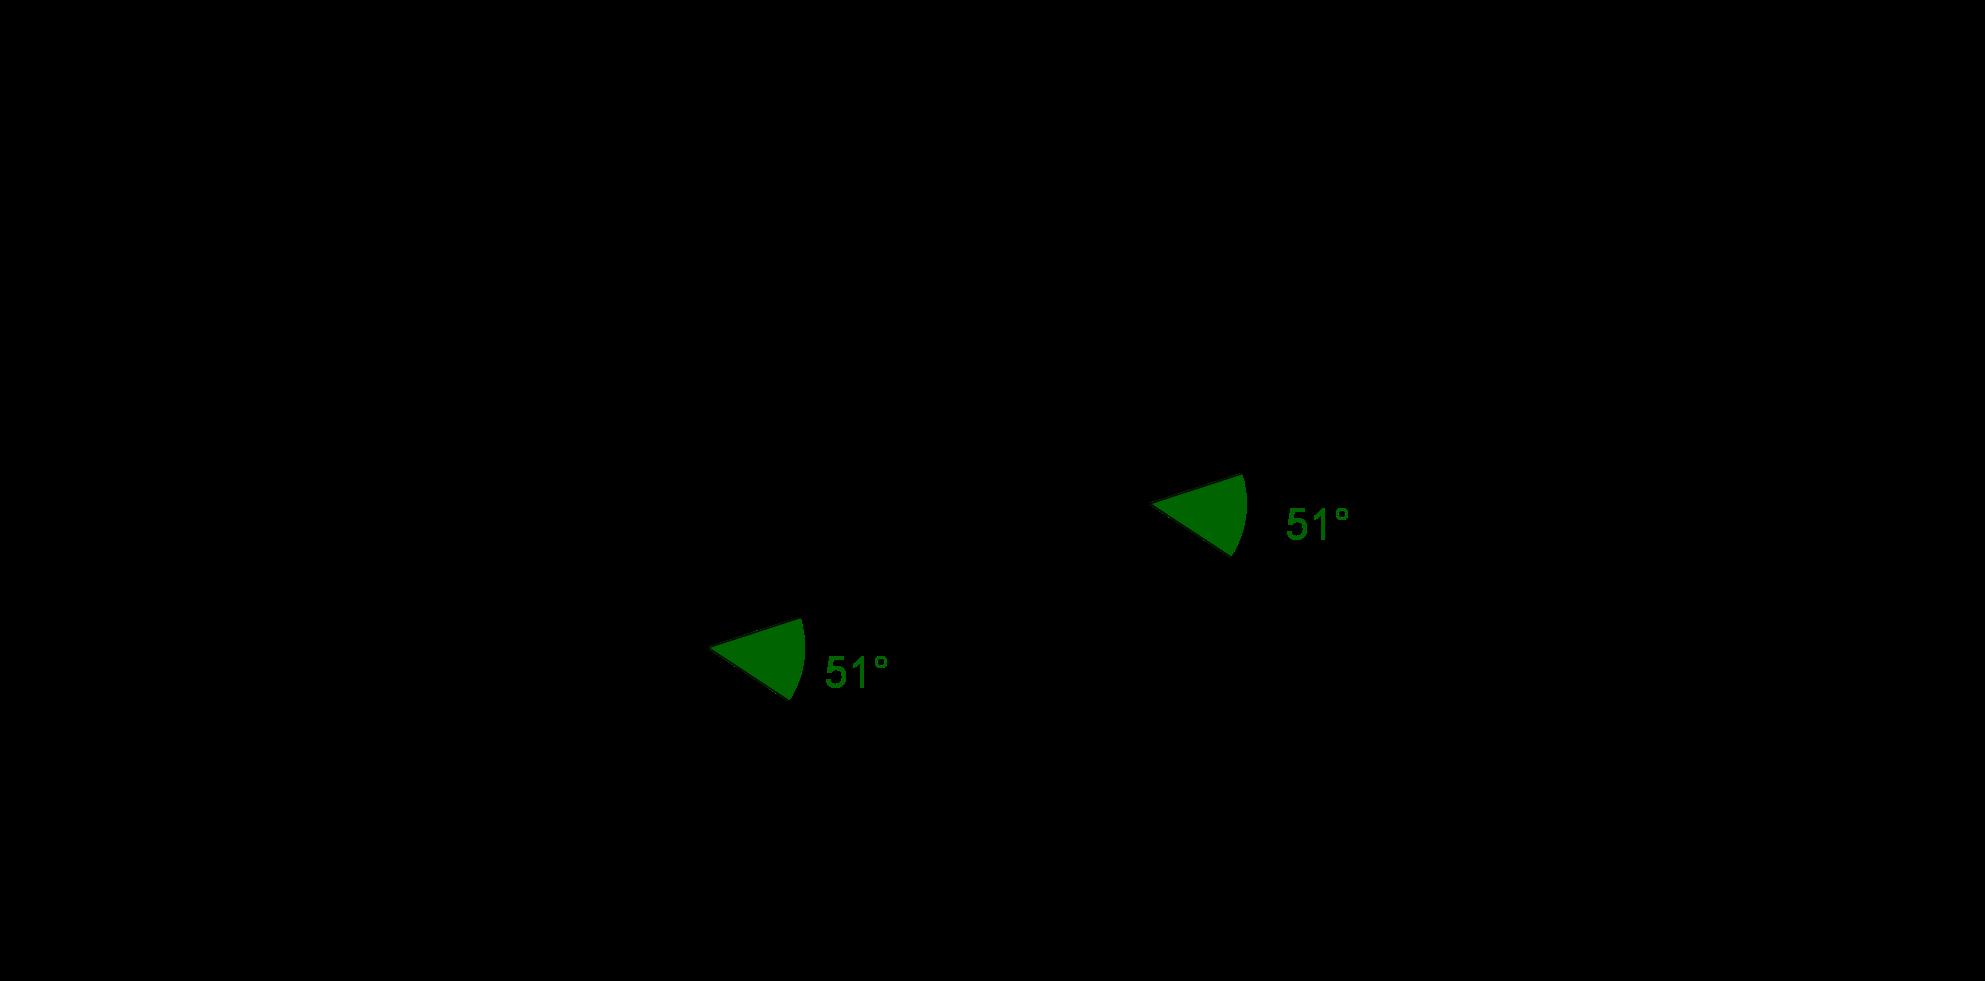 Mathplace angle01-1 Exercice 2 : droites parallèles